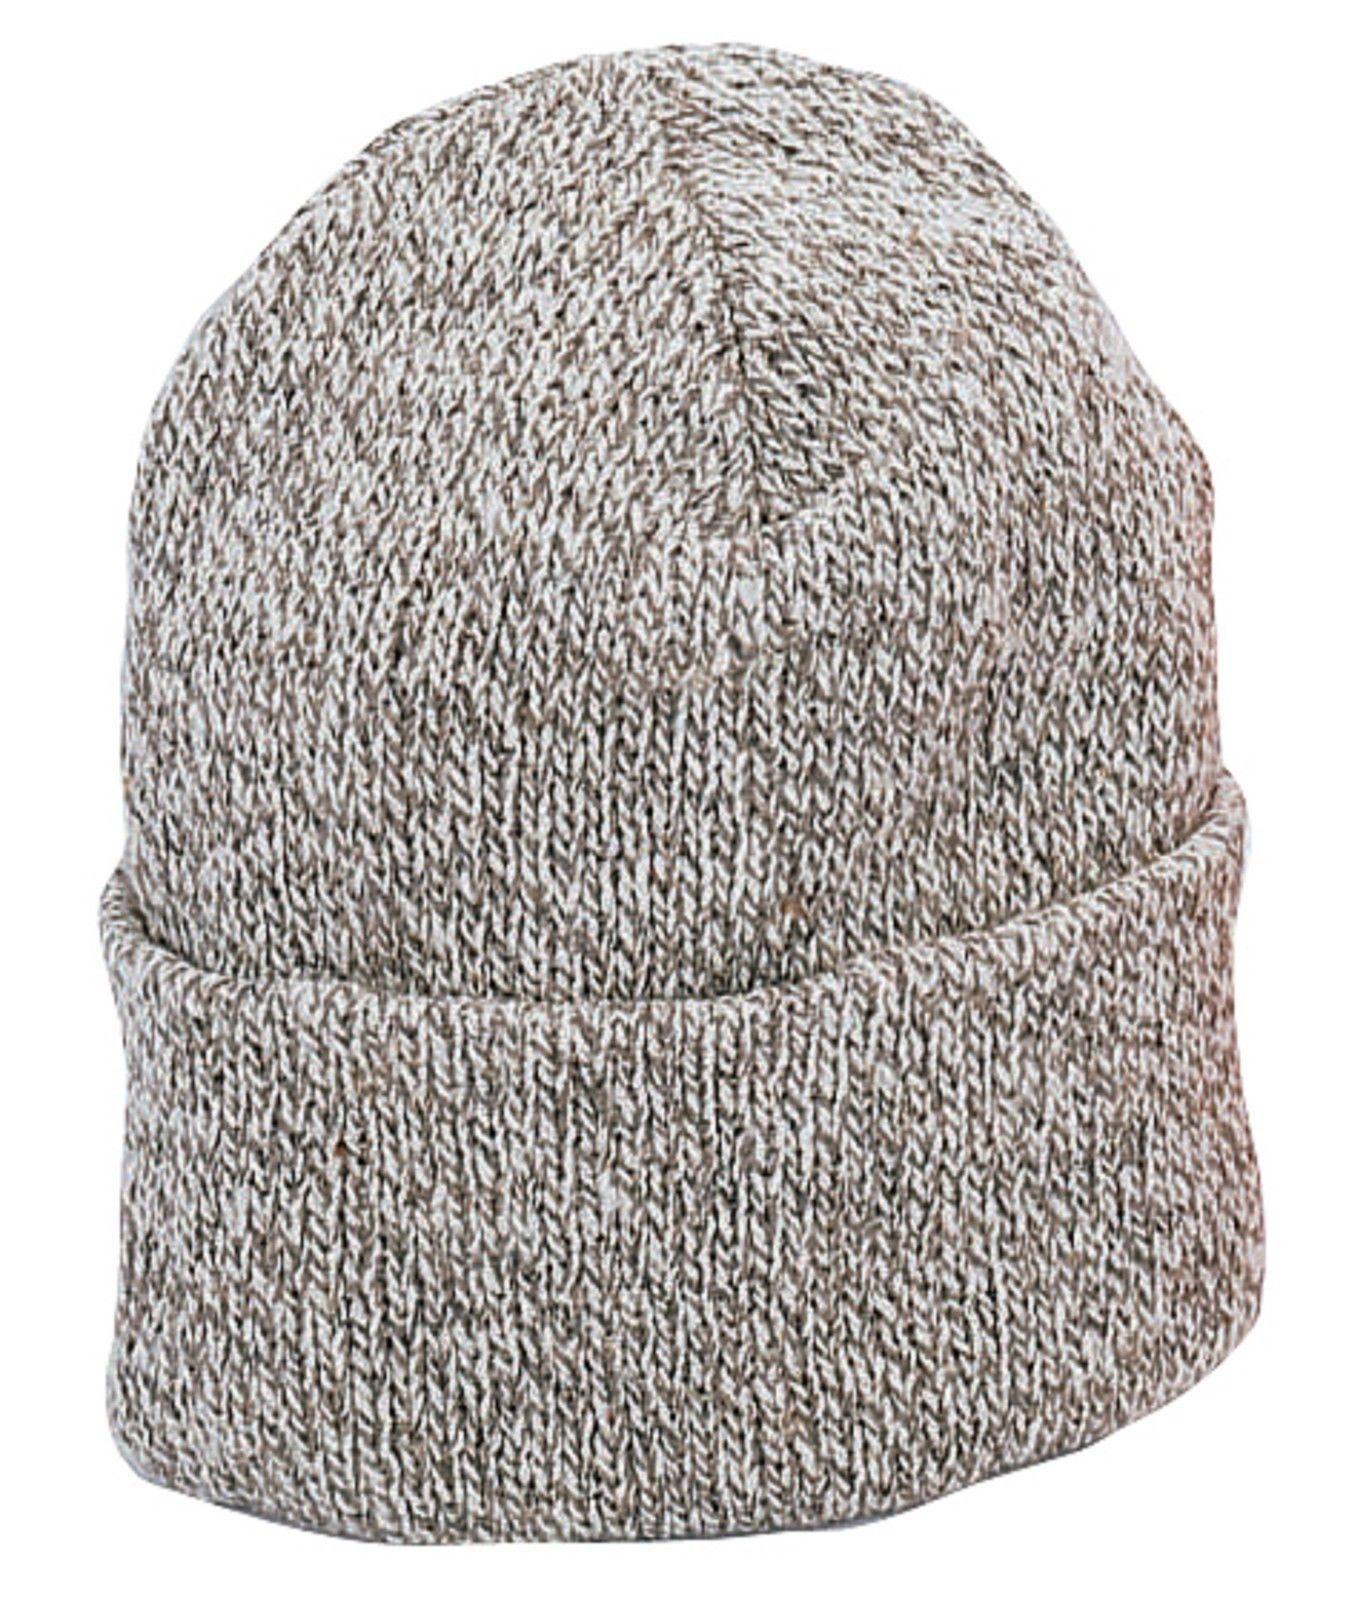 Ragg Wool Winter Watch Cap Cold Weather Soft Snug Comfy Snow Ski Hat USA Made